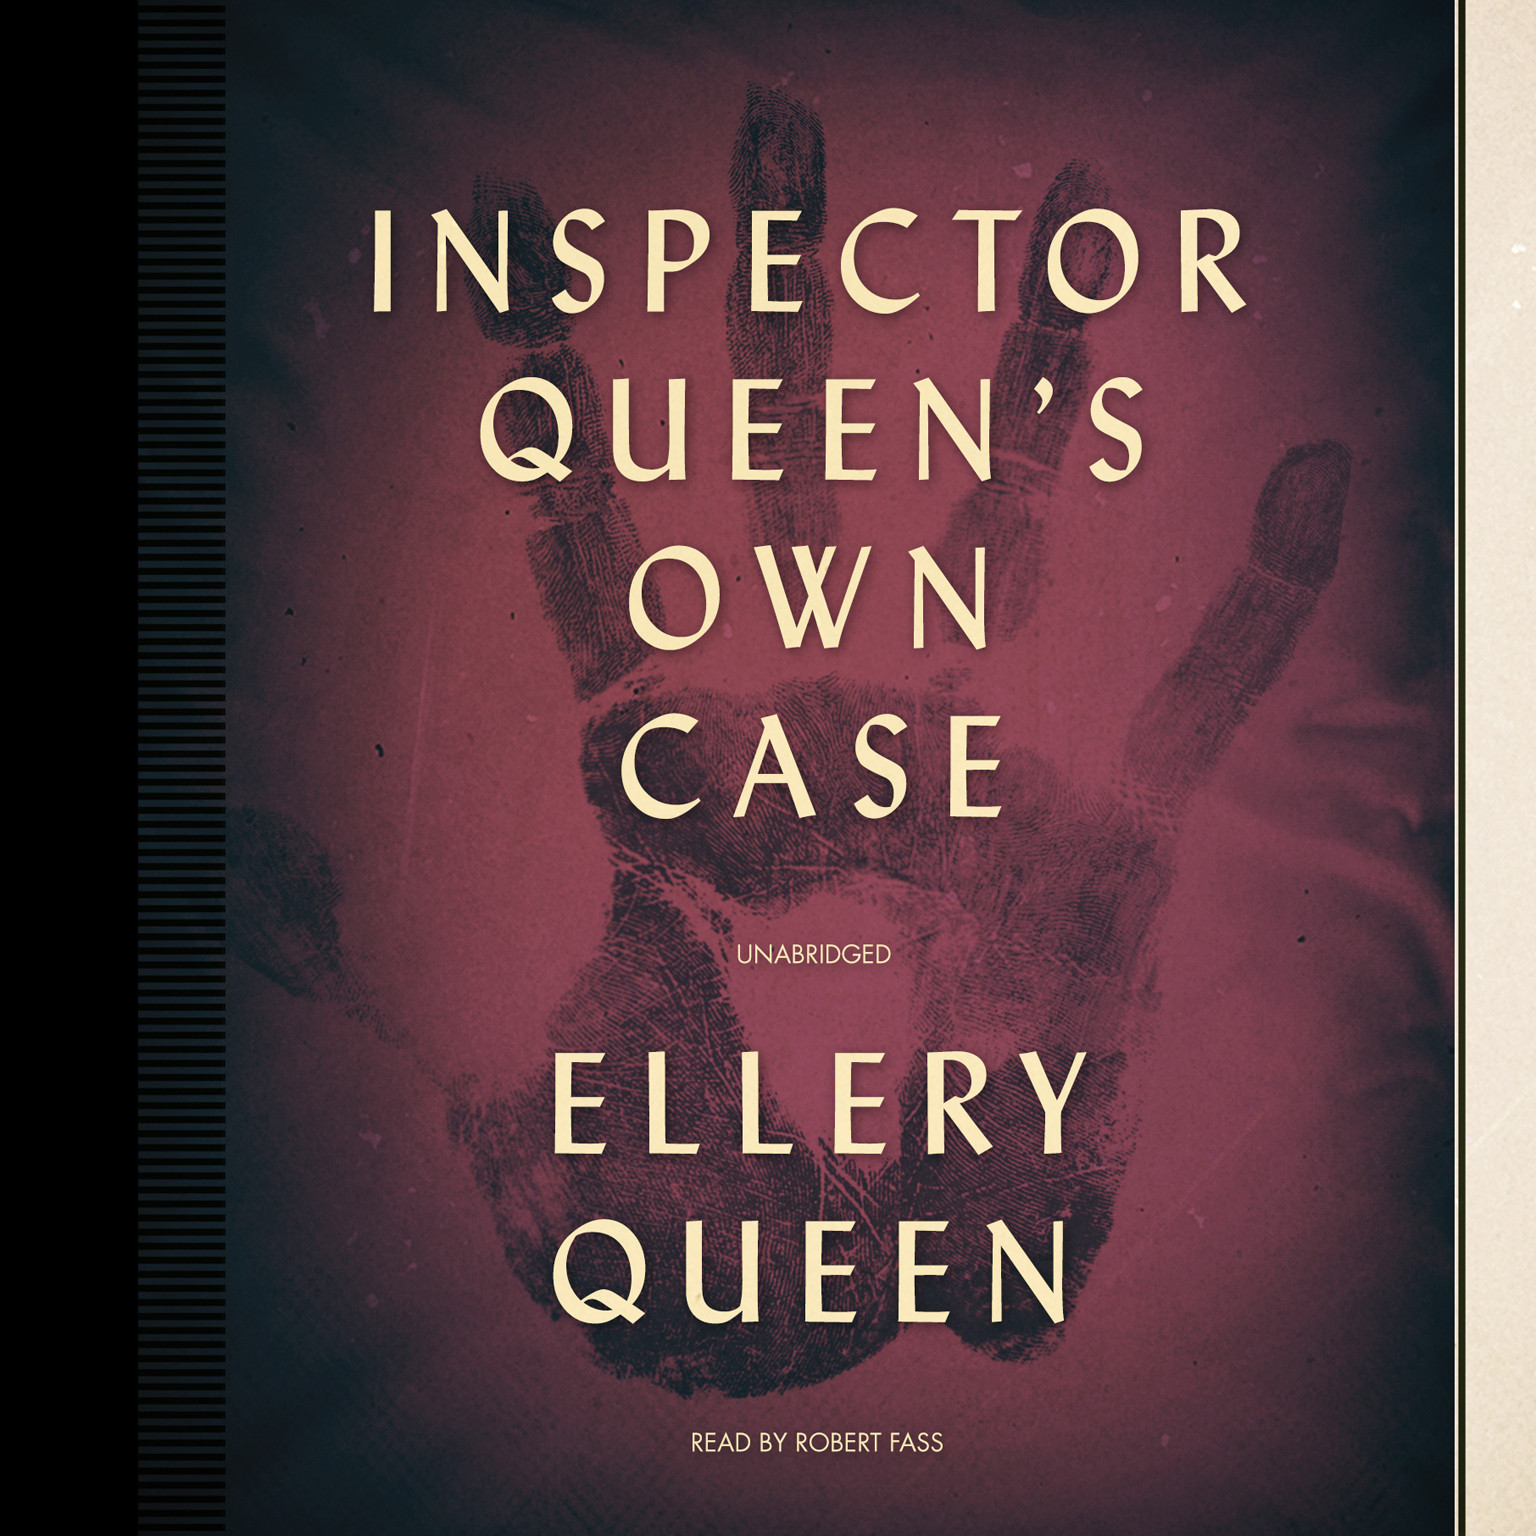 Printable Inspector Queen's Own Case: November Song Audiobook Cover Art